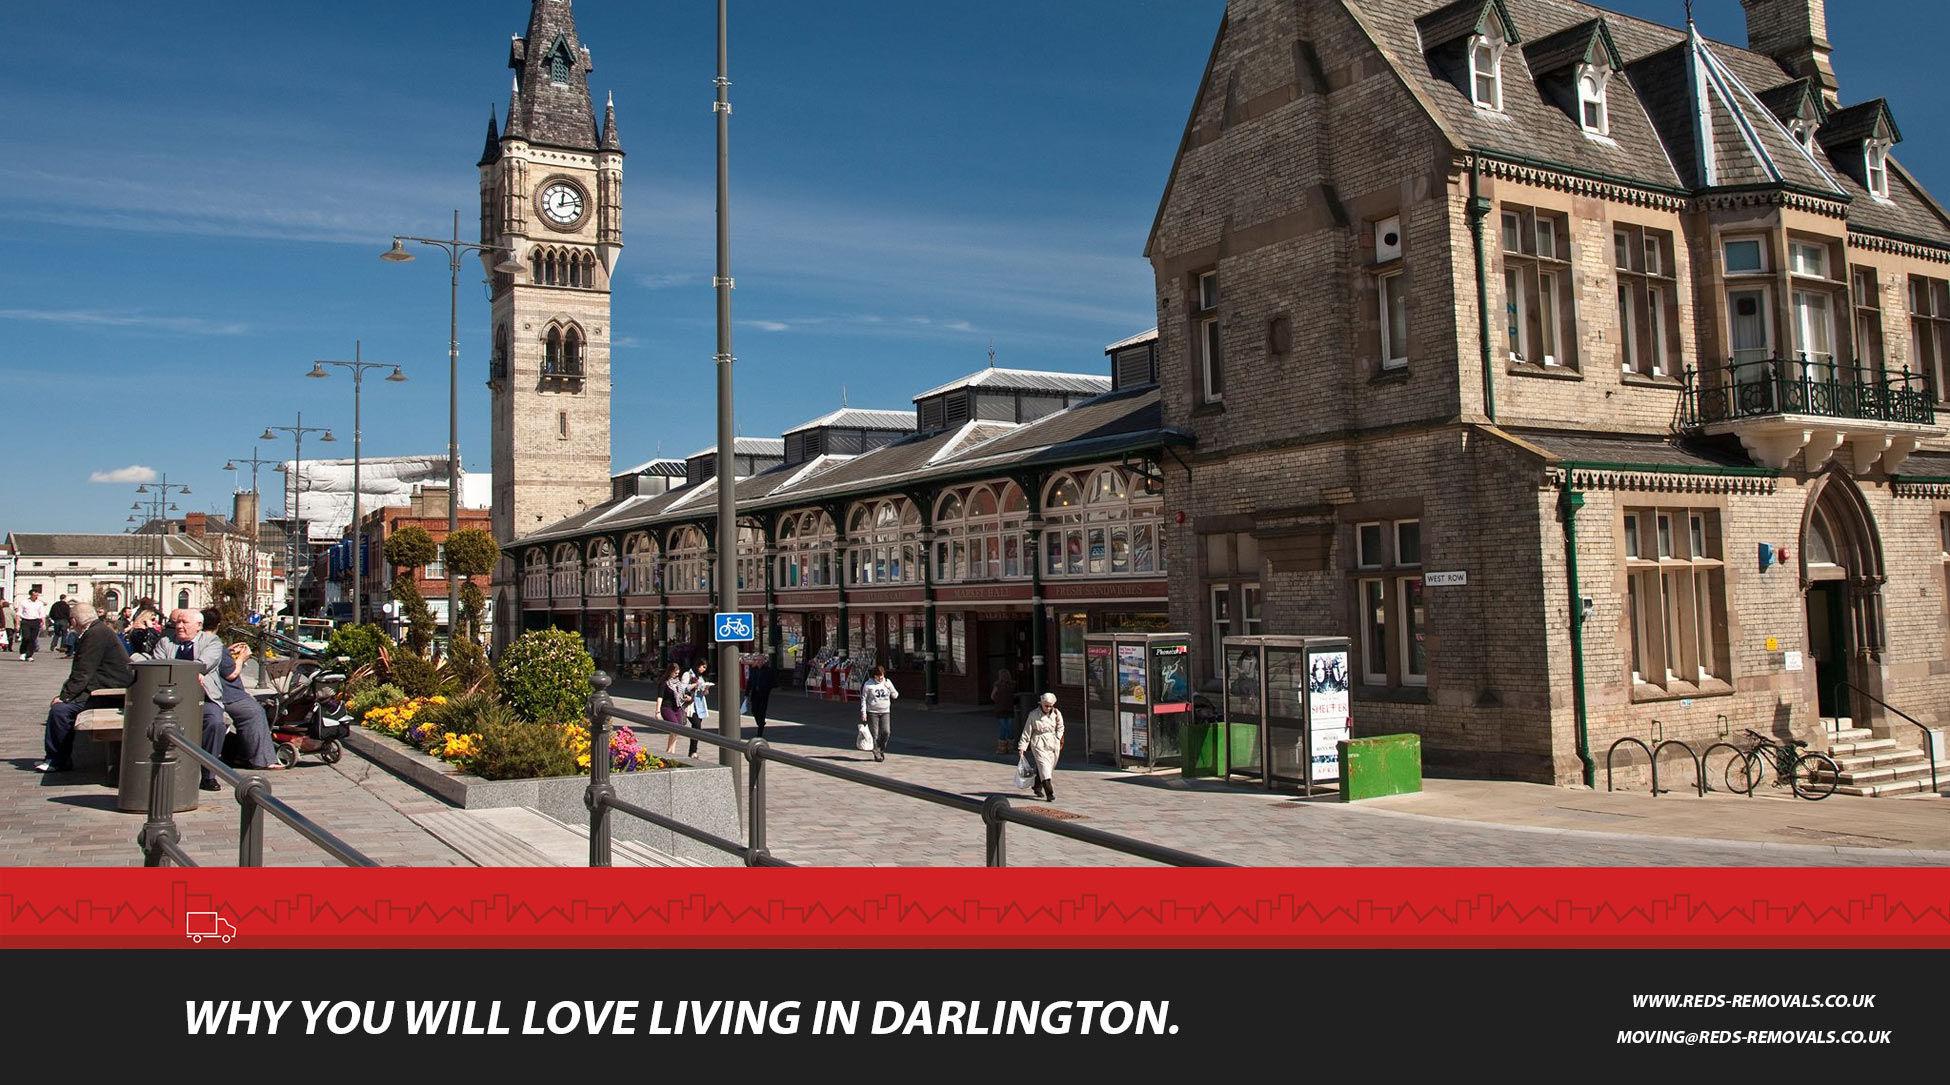 darlington - photo #34